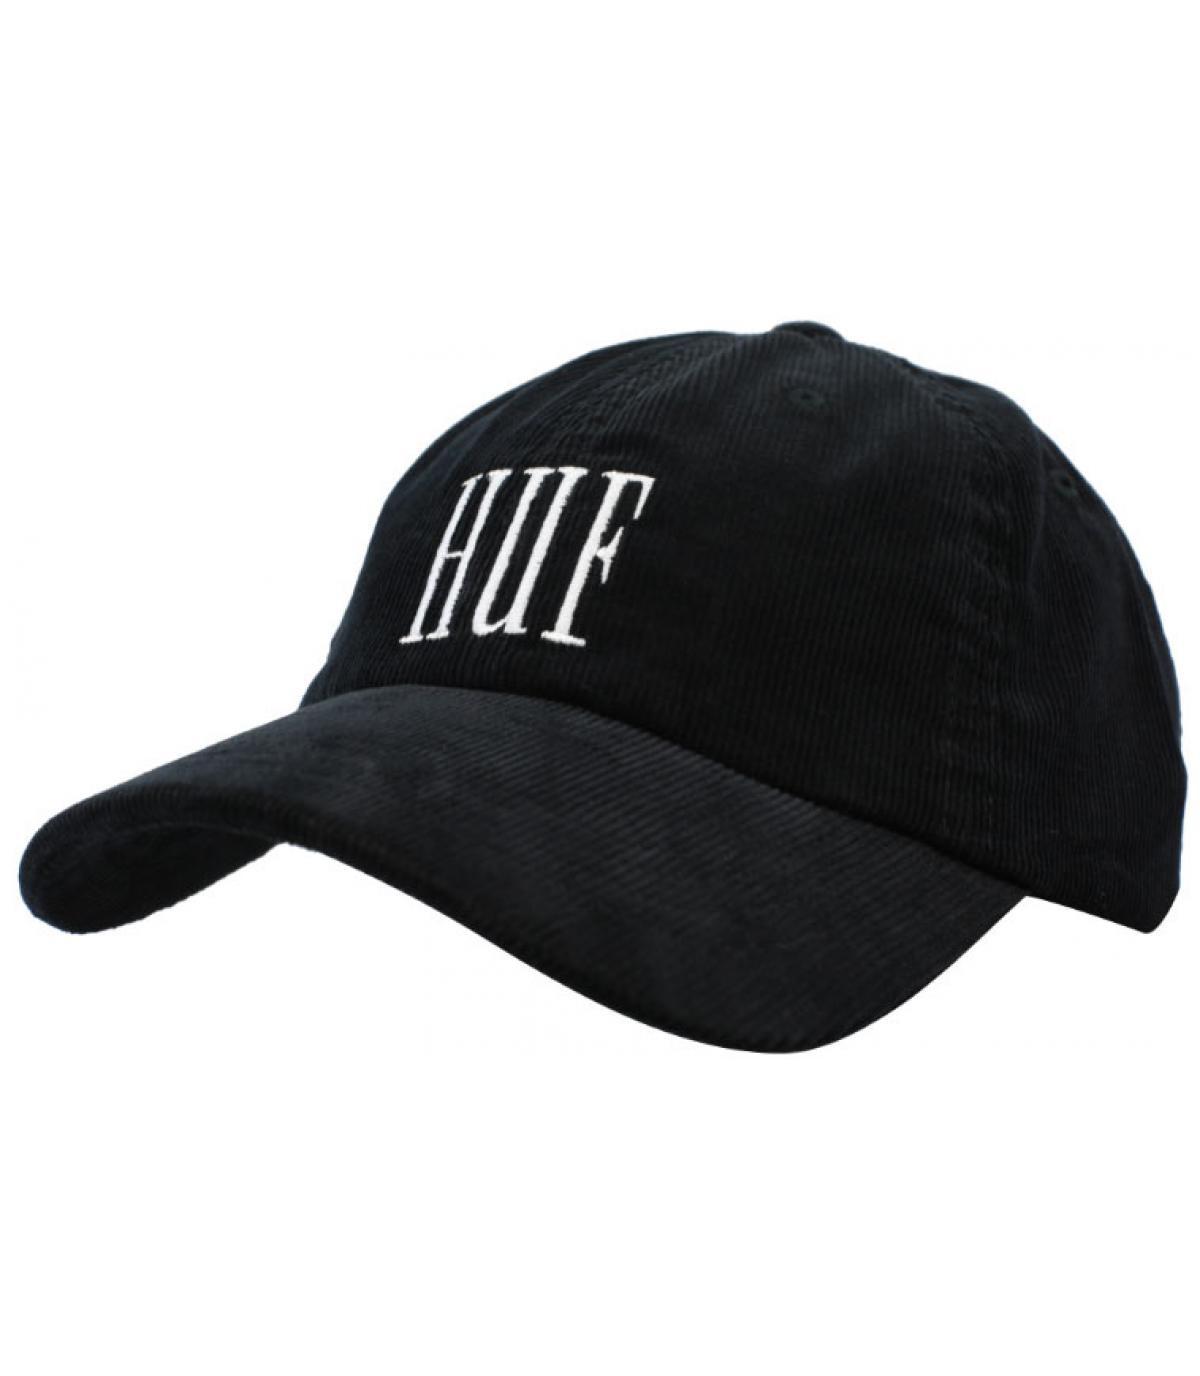 black Huf cap corduroy - Marka Corduroy licor Huf - image 1 ... 284ec5f6f51